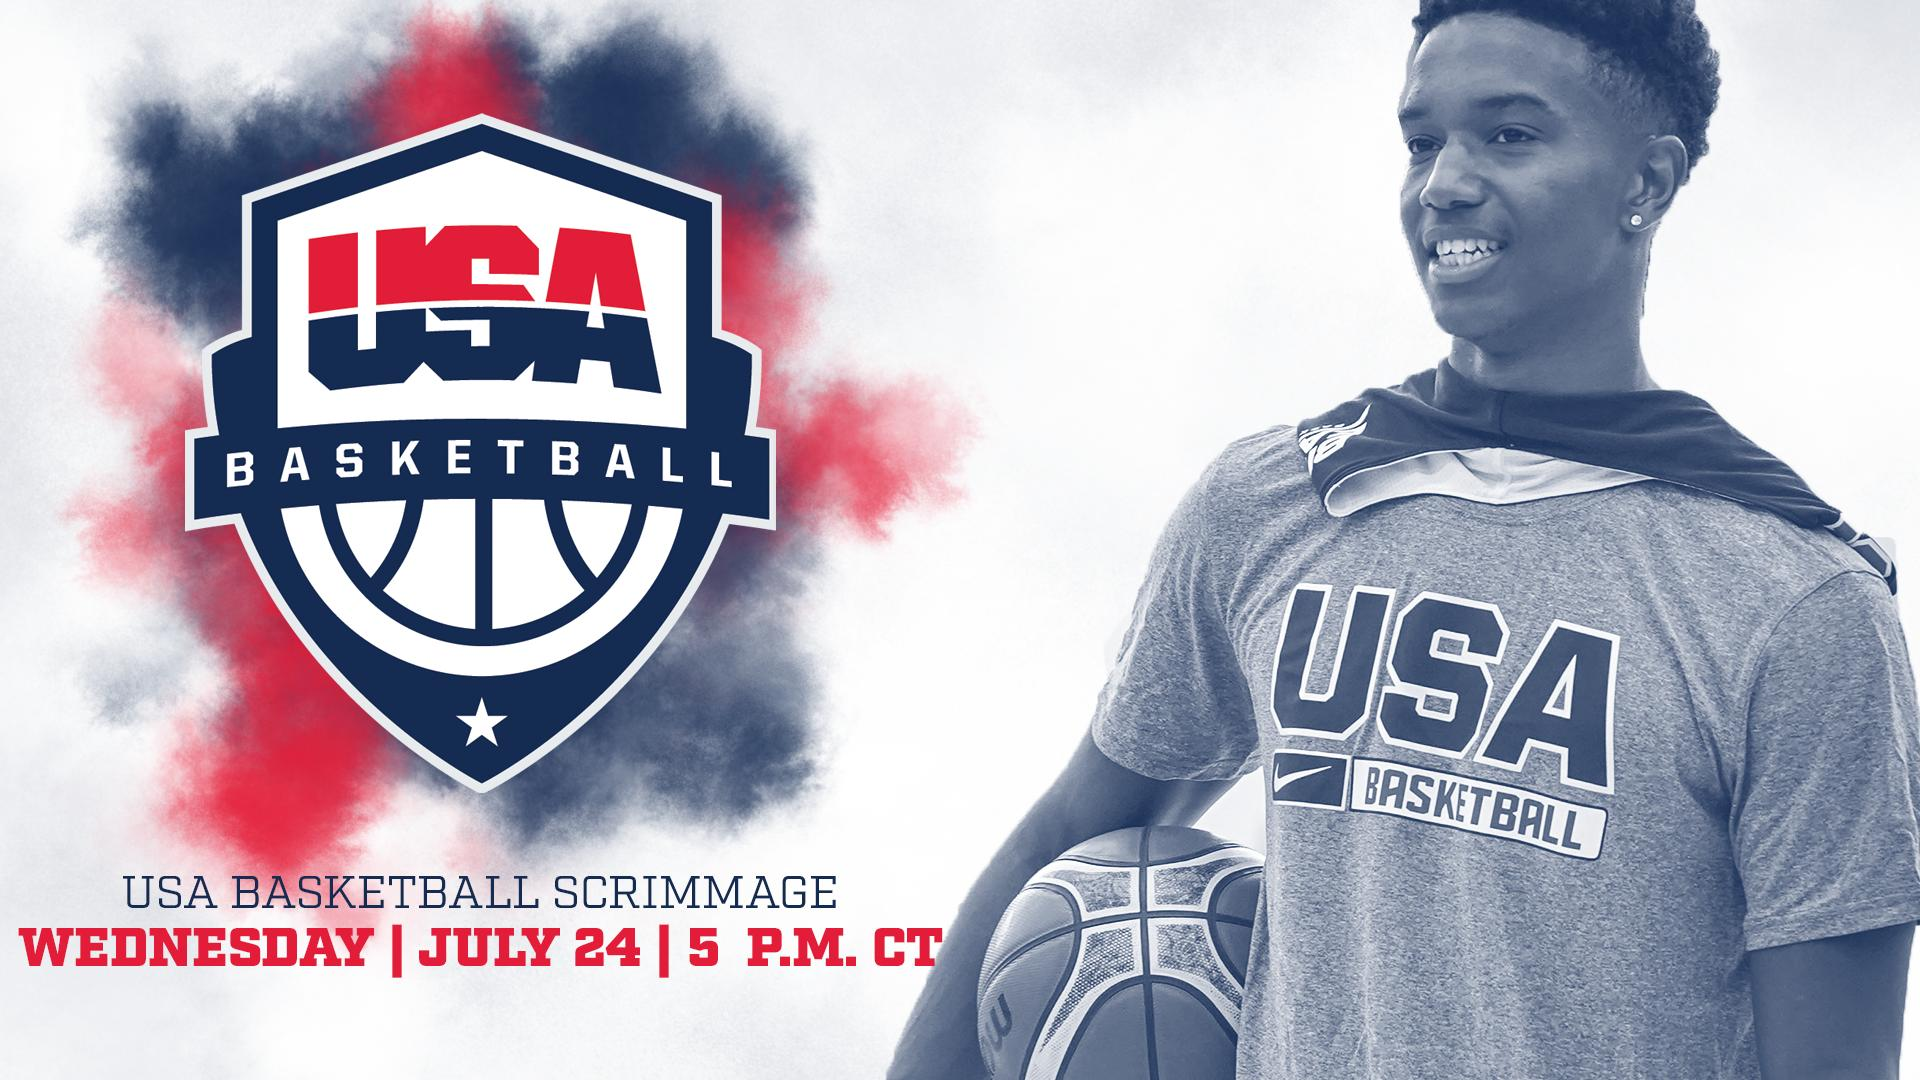 Creighton Bluejays NCAA Basketball: 📆 Tomorrow ⏰ 5:00 P.M. 📺 https://t.co/bgmwtF9pDO  STORY: https://t.co/Cr0Q7oNdC...